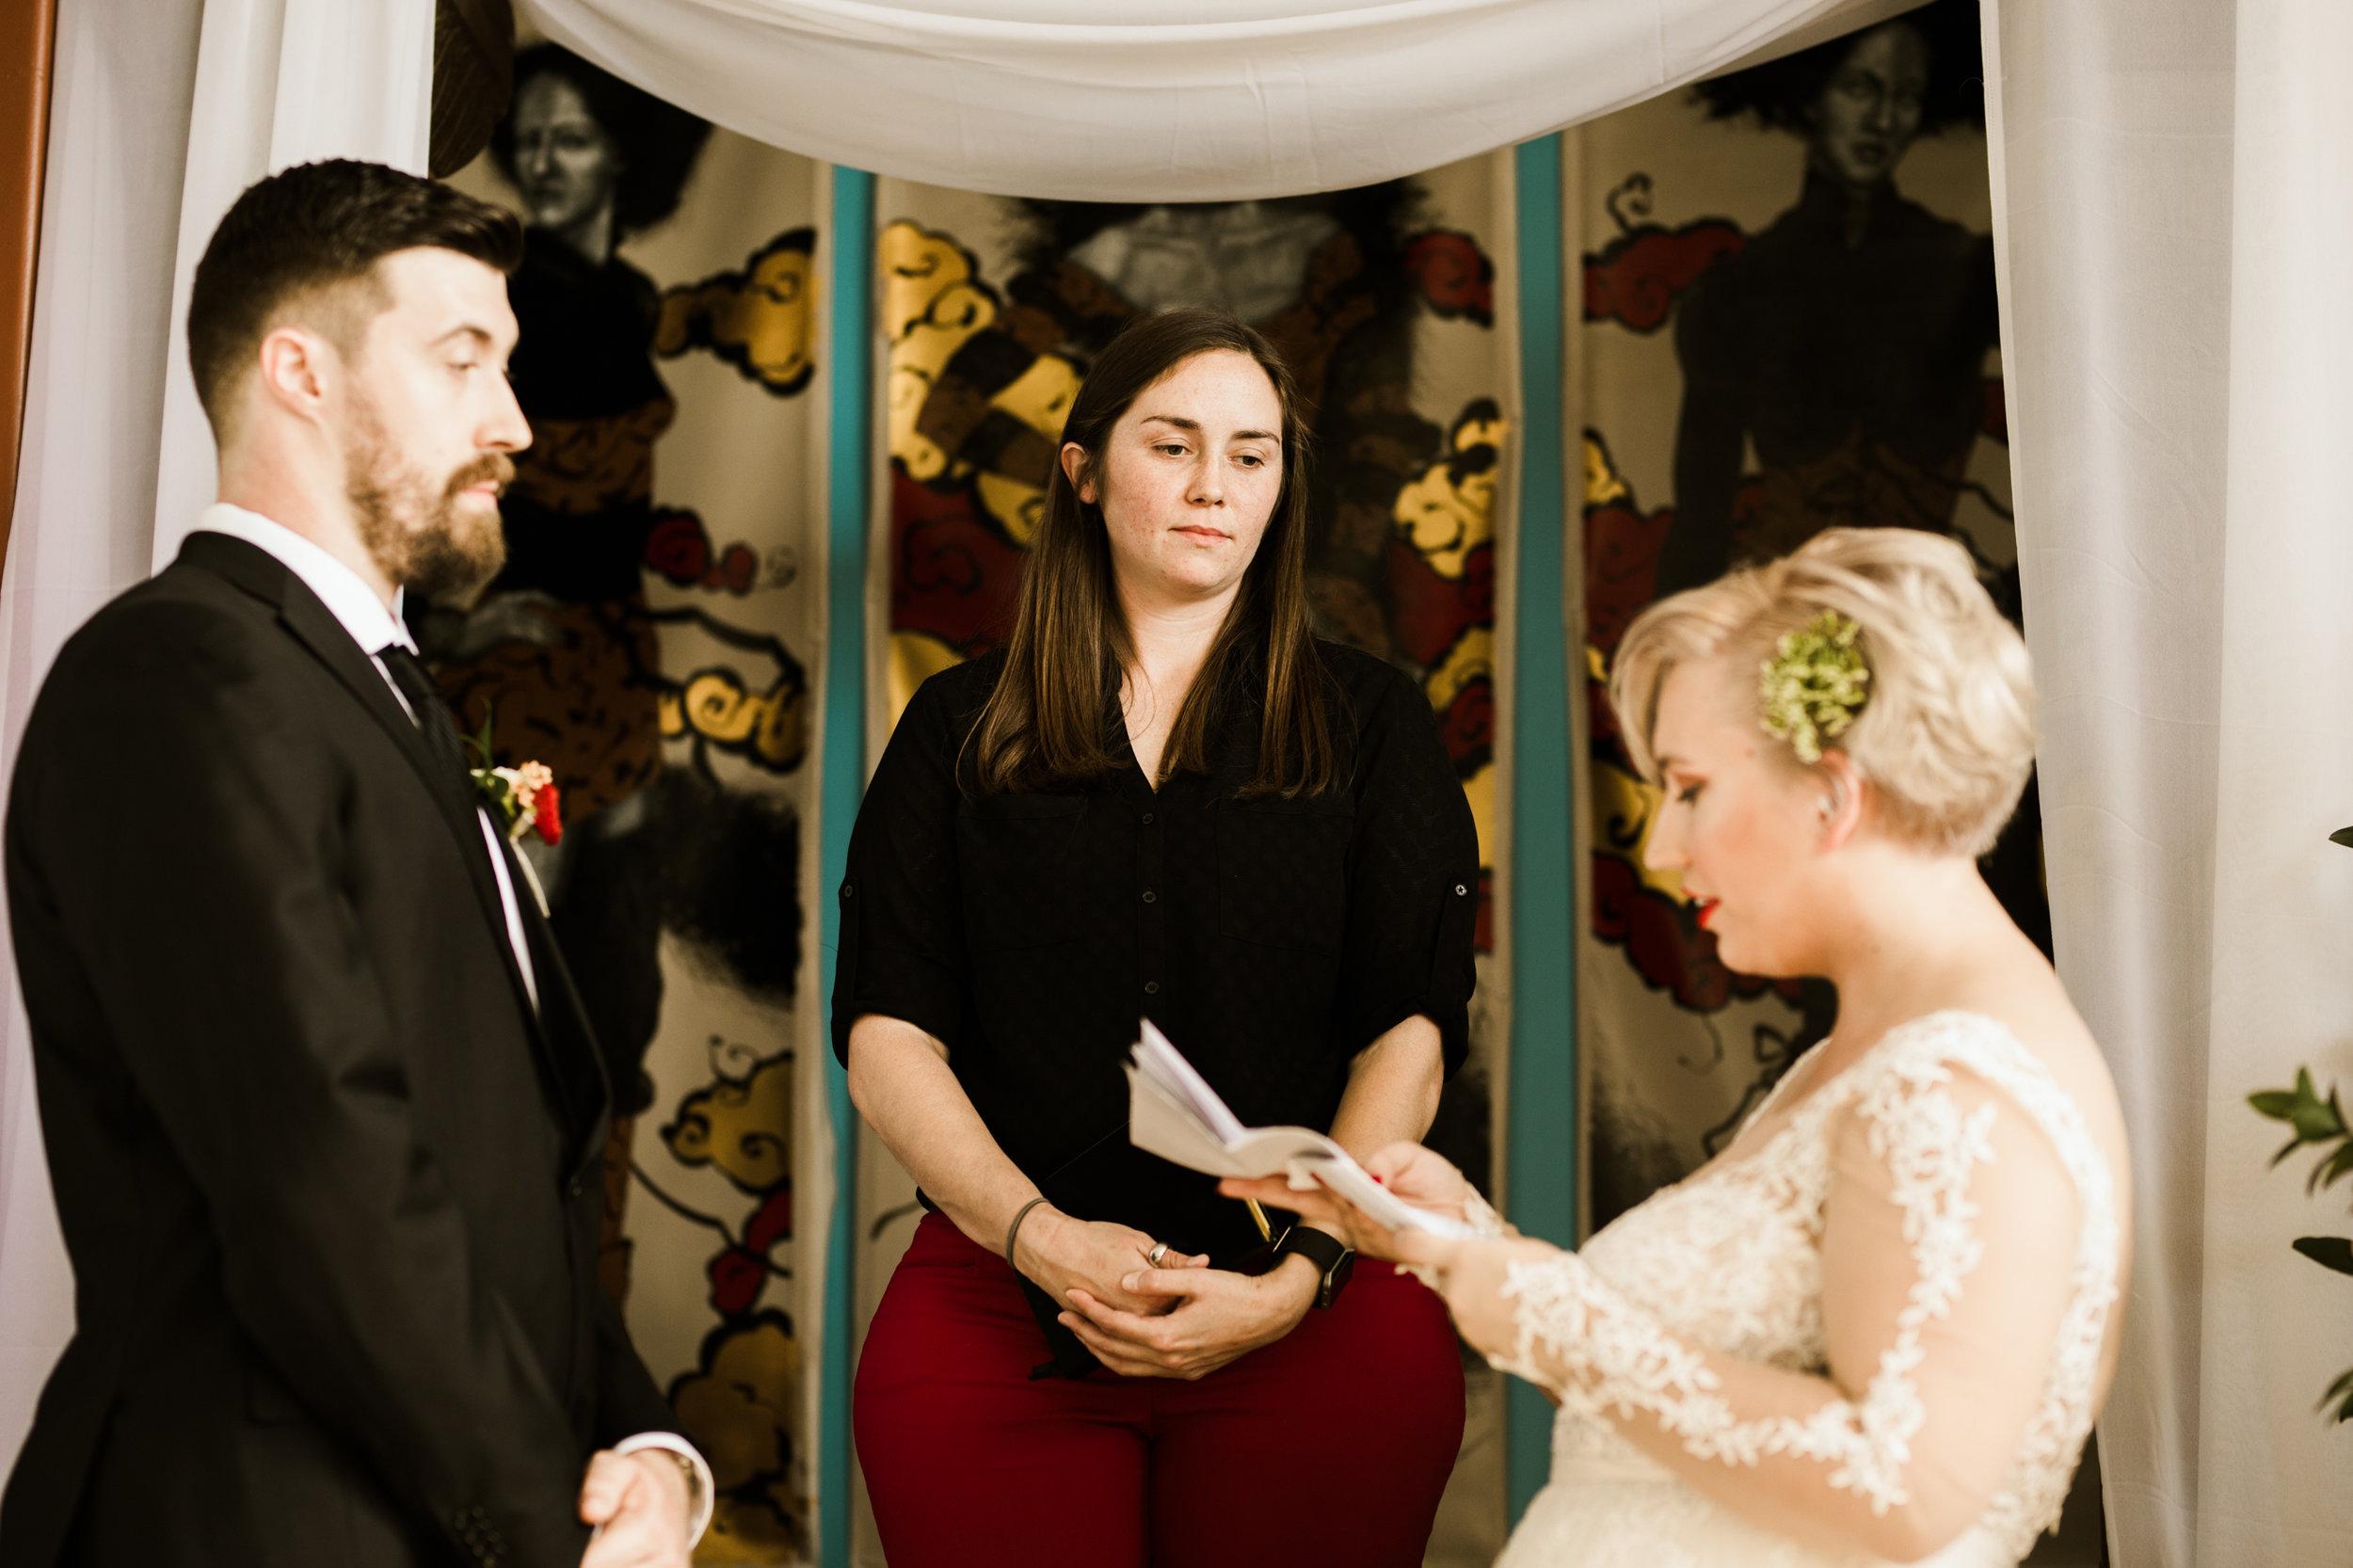 Kentucky Wedding Louisville Wedding Photographer 2018 Crystal Ludwick Photo Louisville Wedding Photographer Kentucky Wedding Photographer (38 of 105).jpg